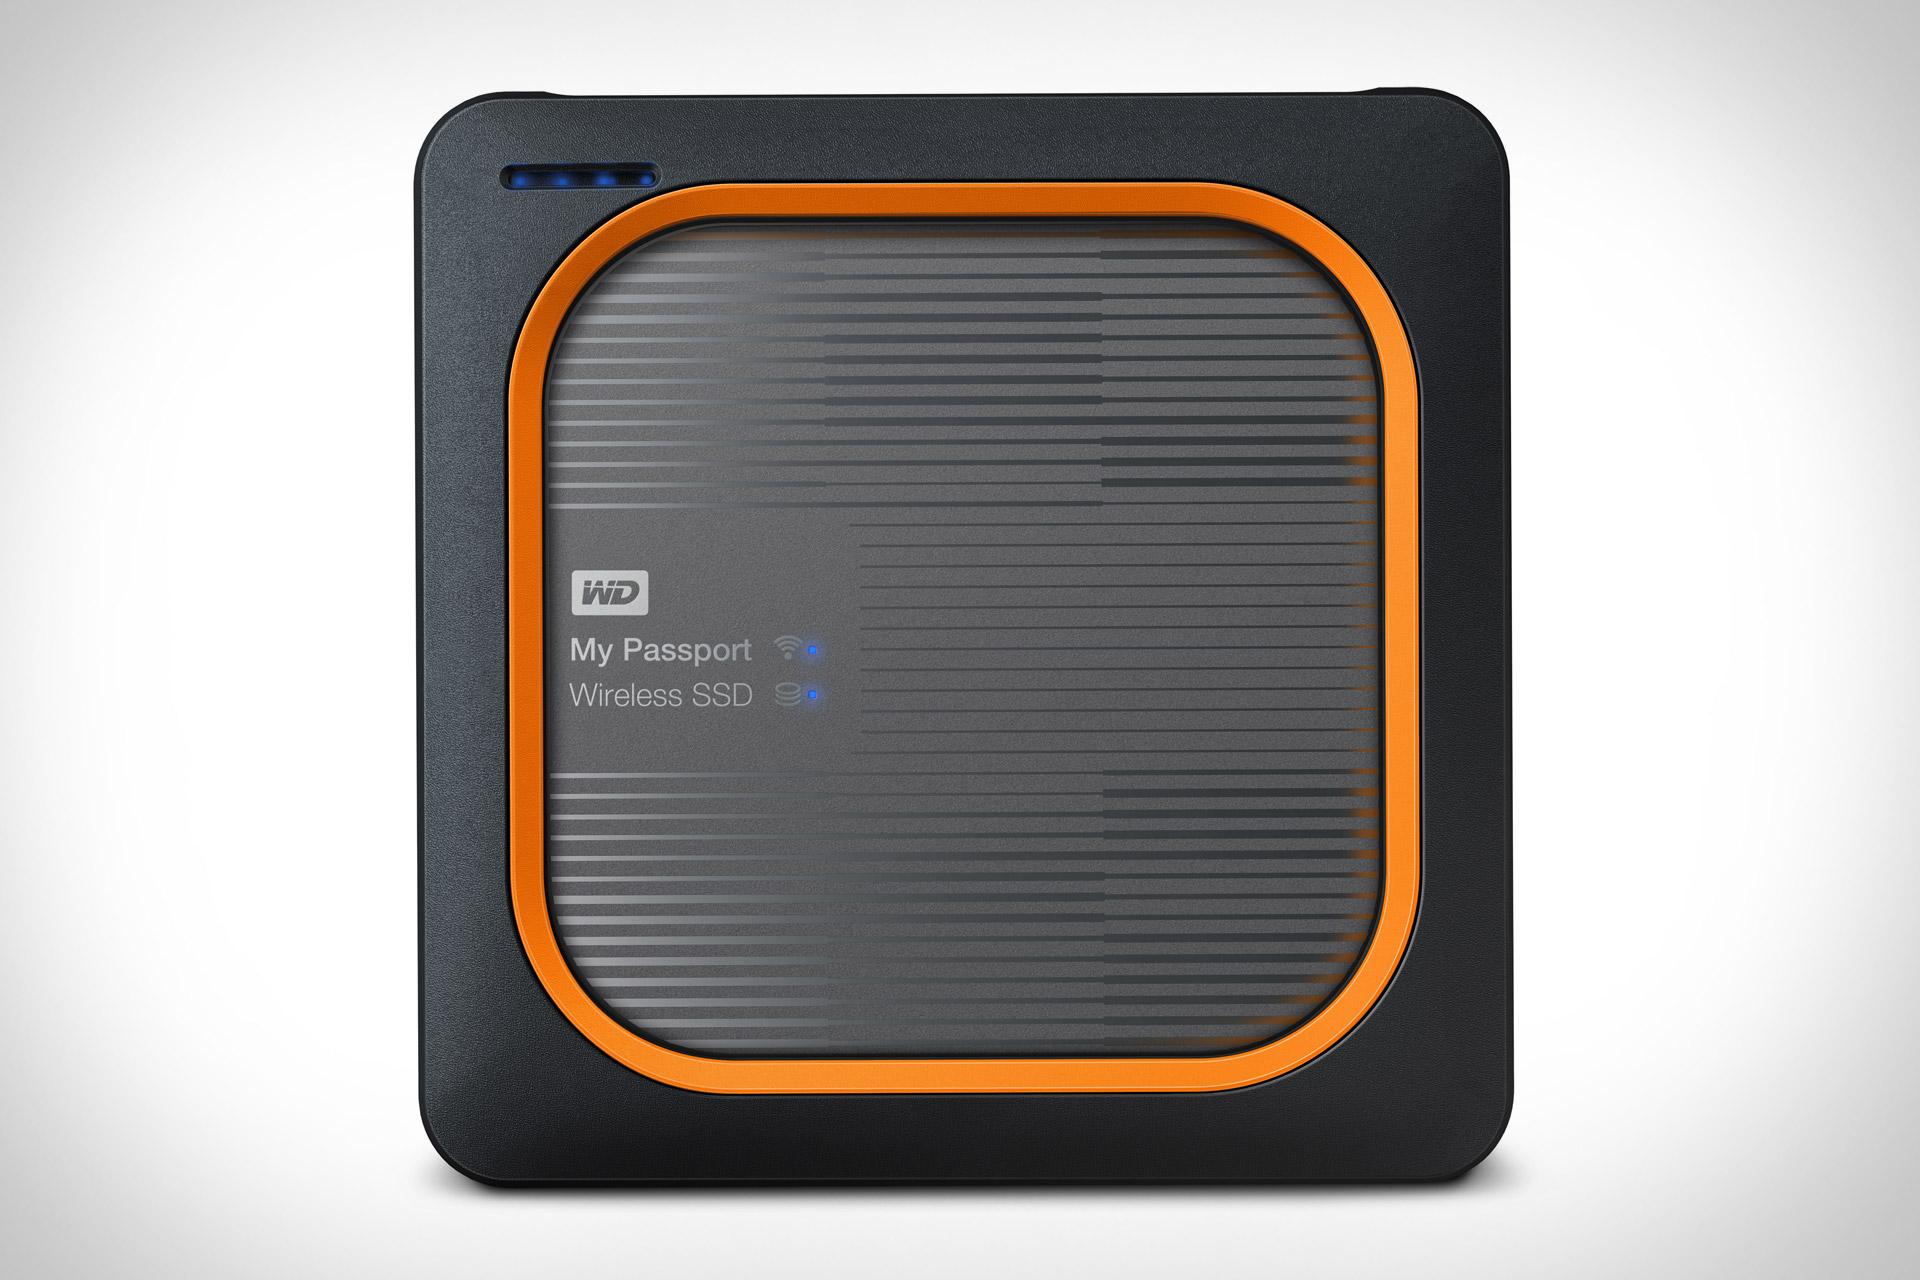 Western Digital My Passport Wireless SSD